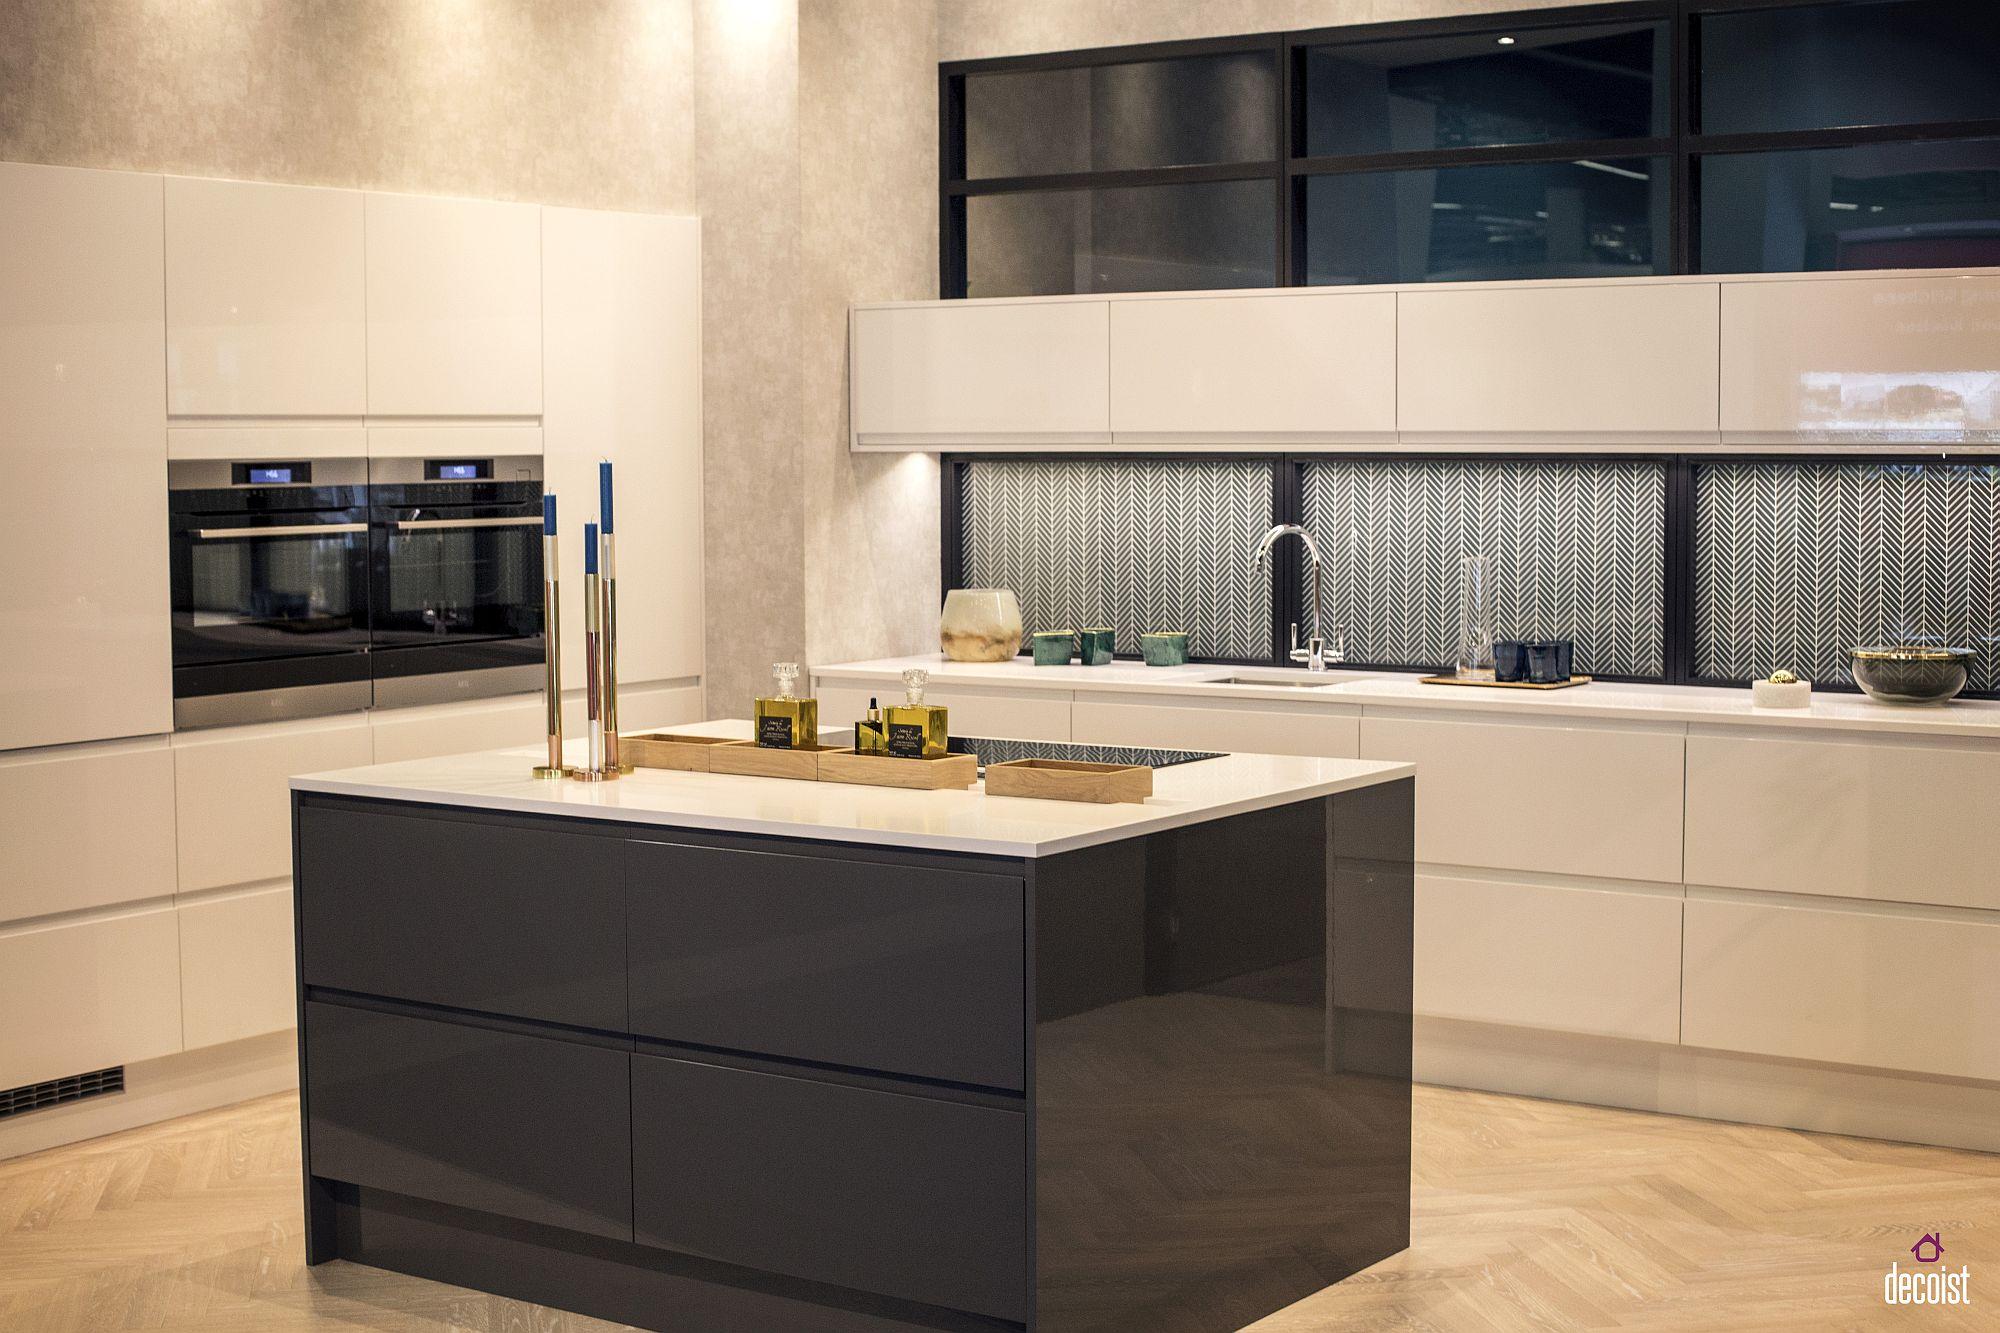 Subtle addition of chevron pattern to the modern kitchen